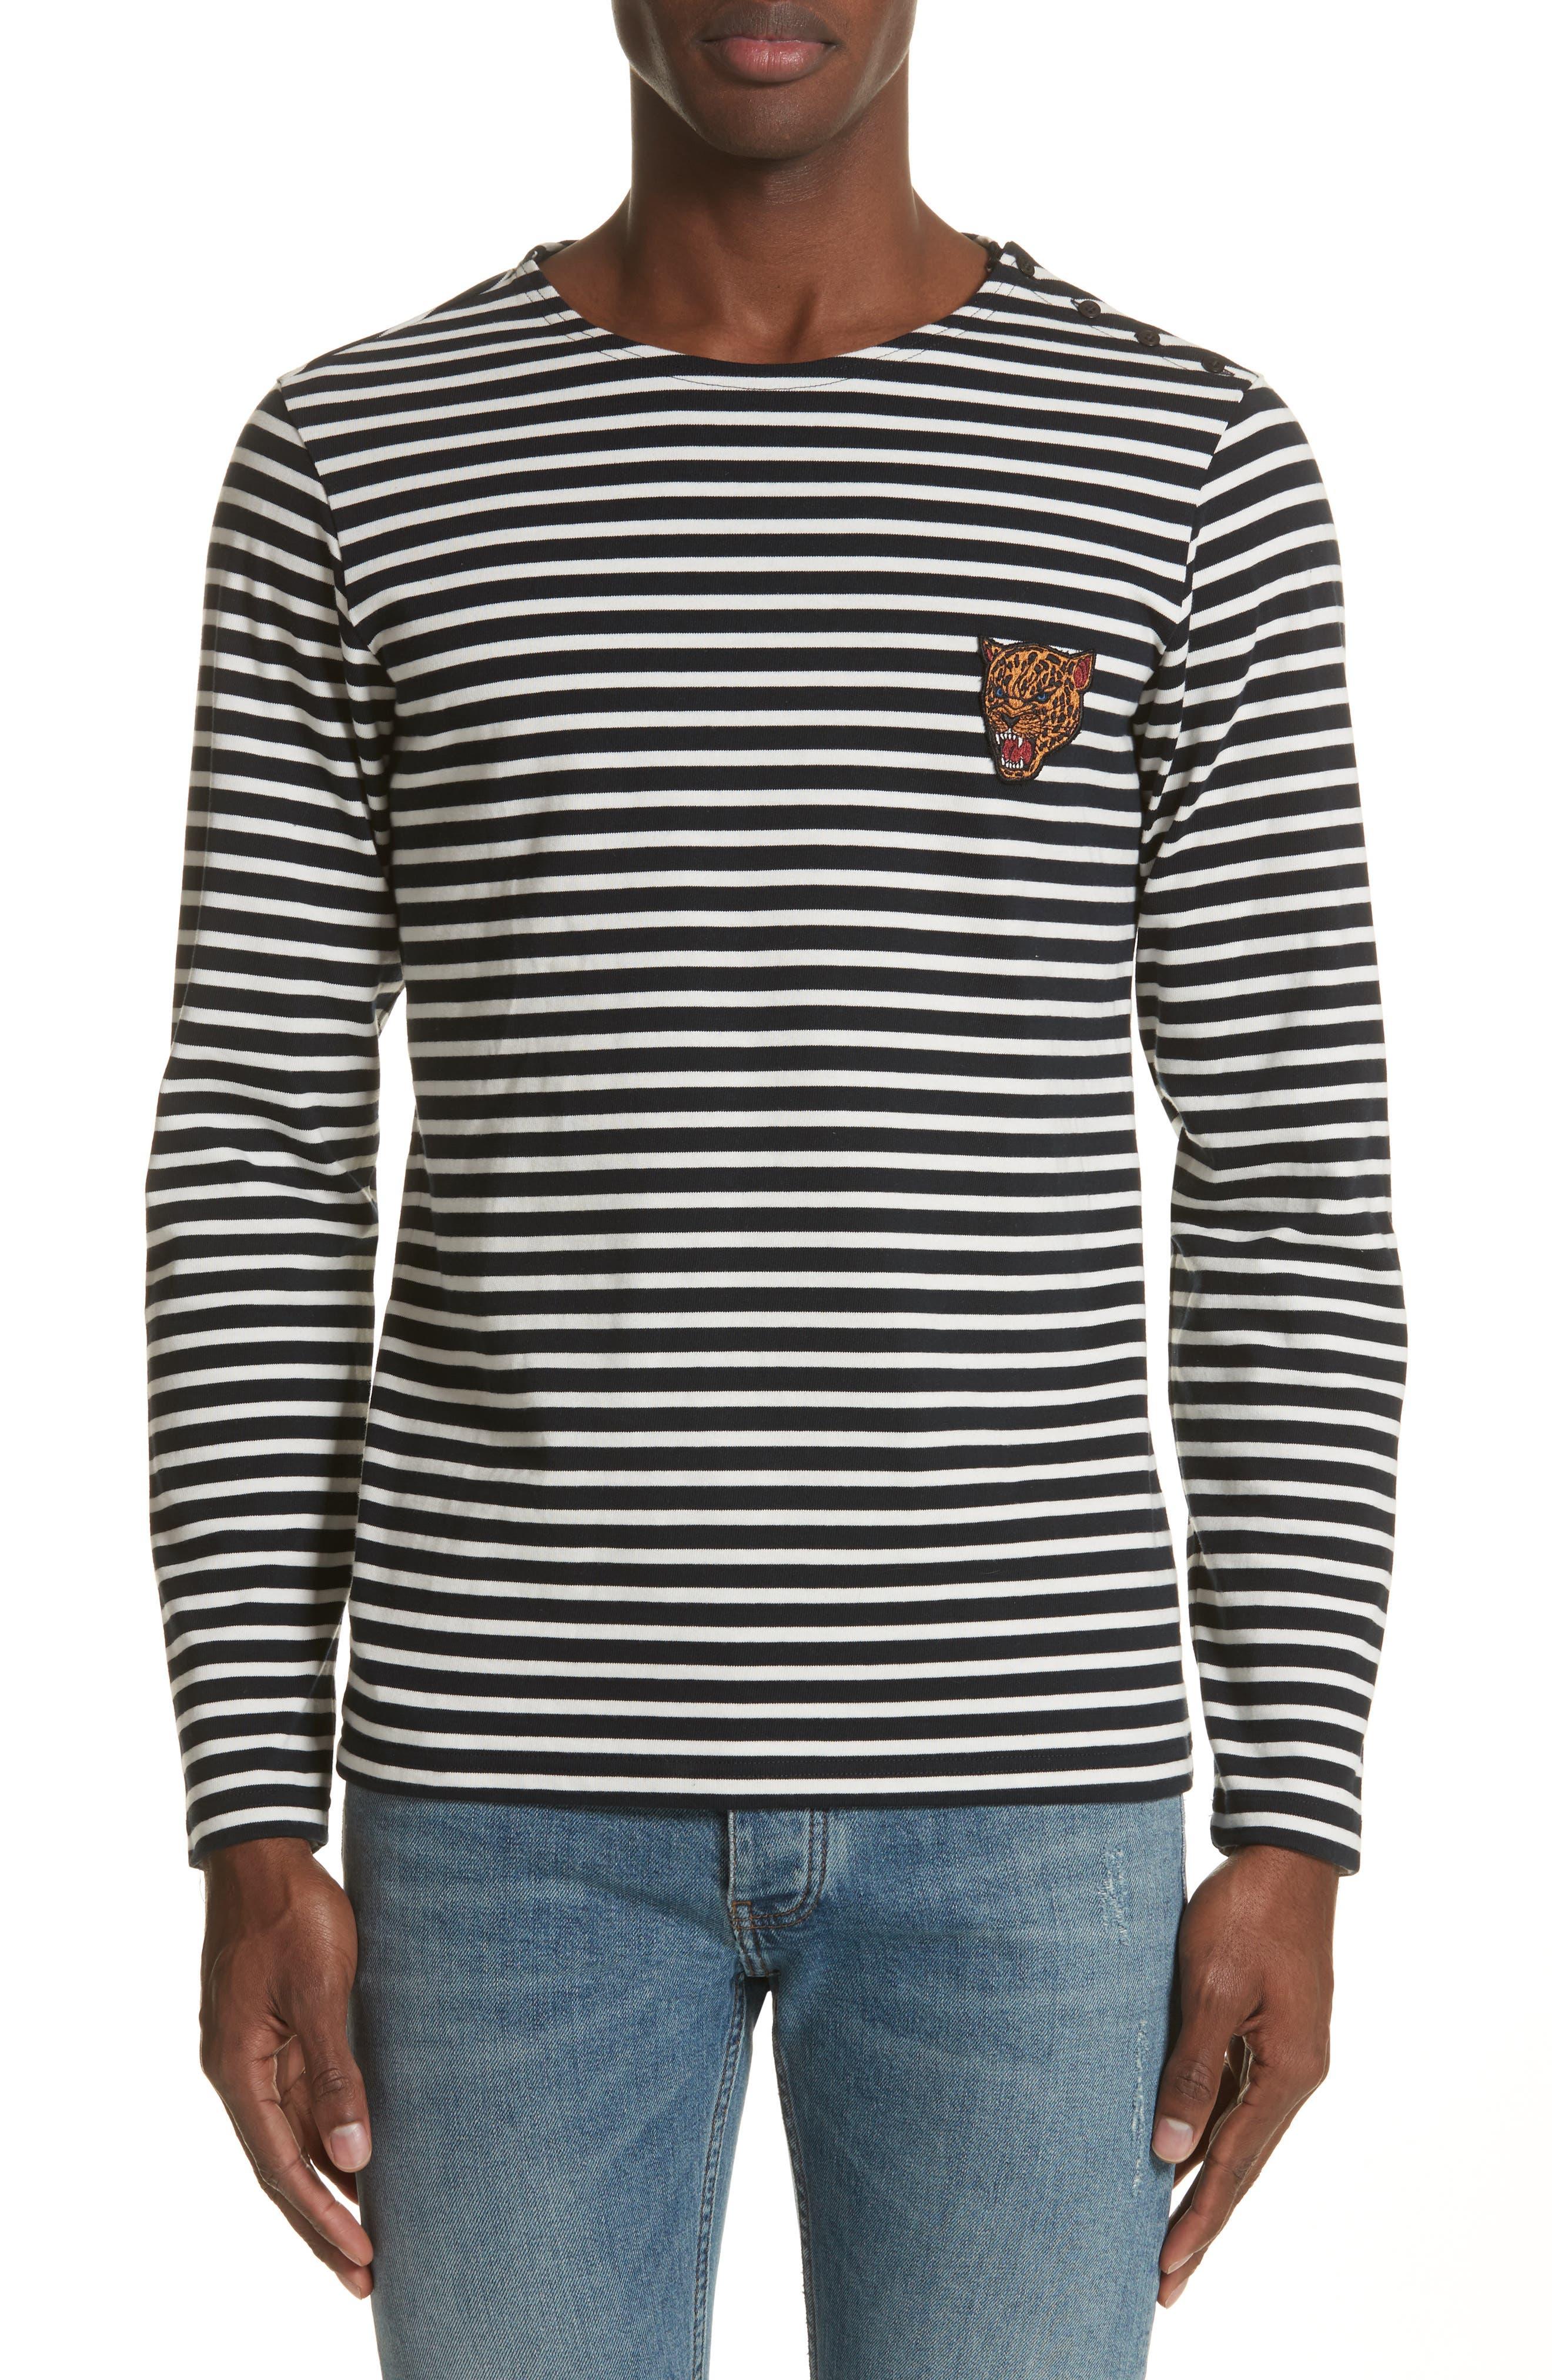 The Kooples Stripe Long Sleeve T-Shirt